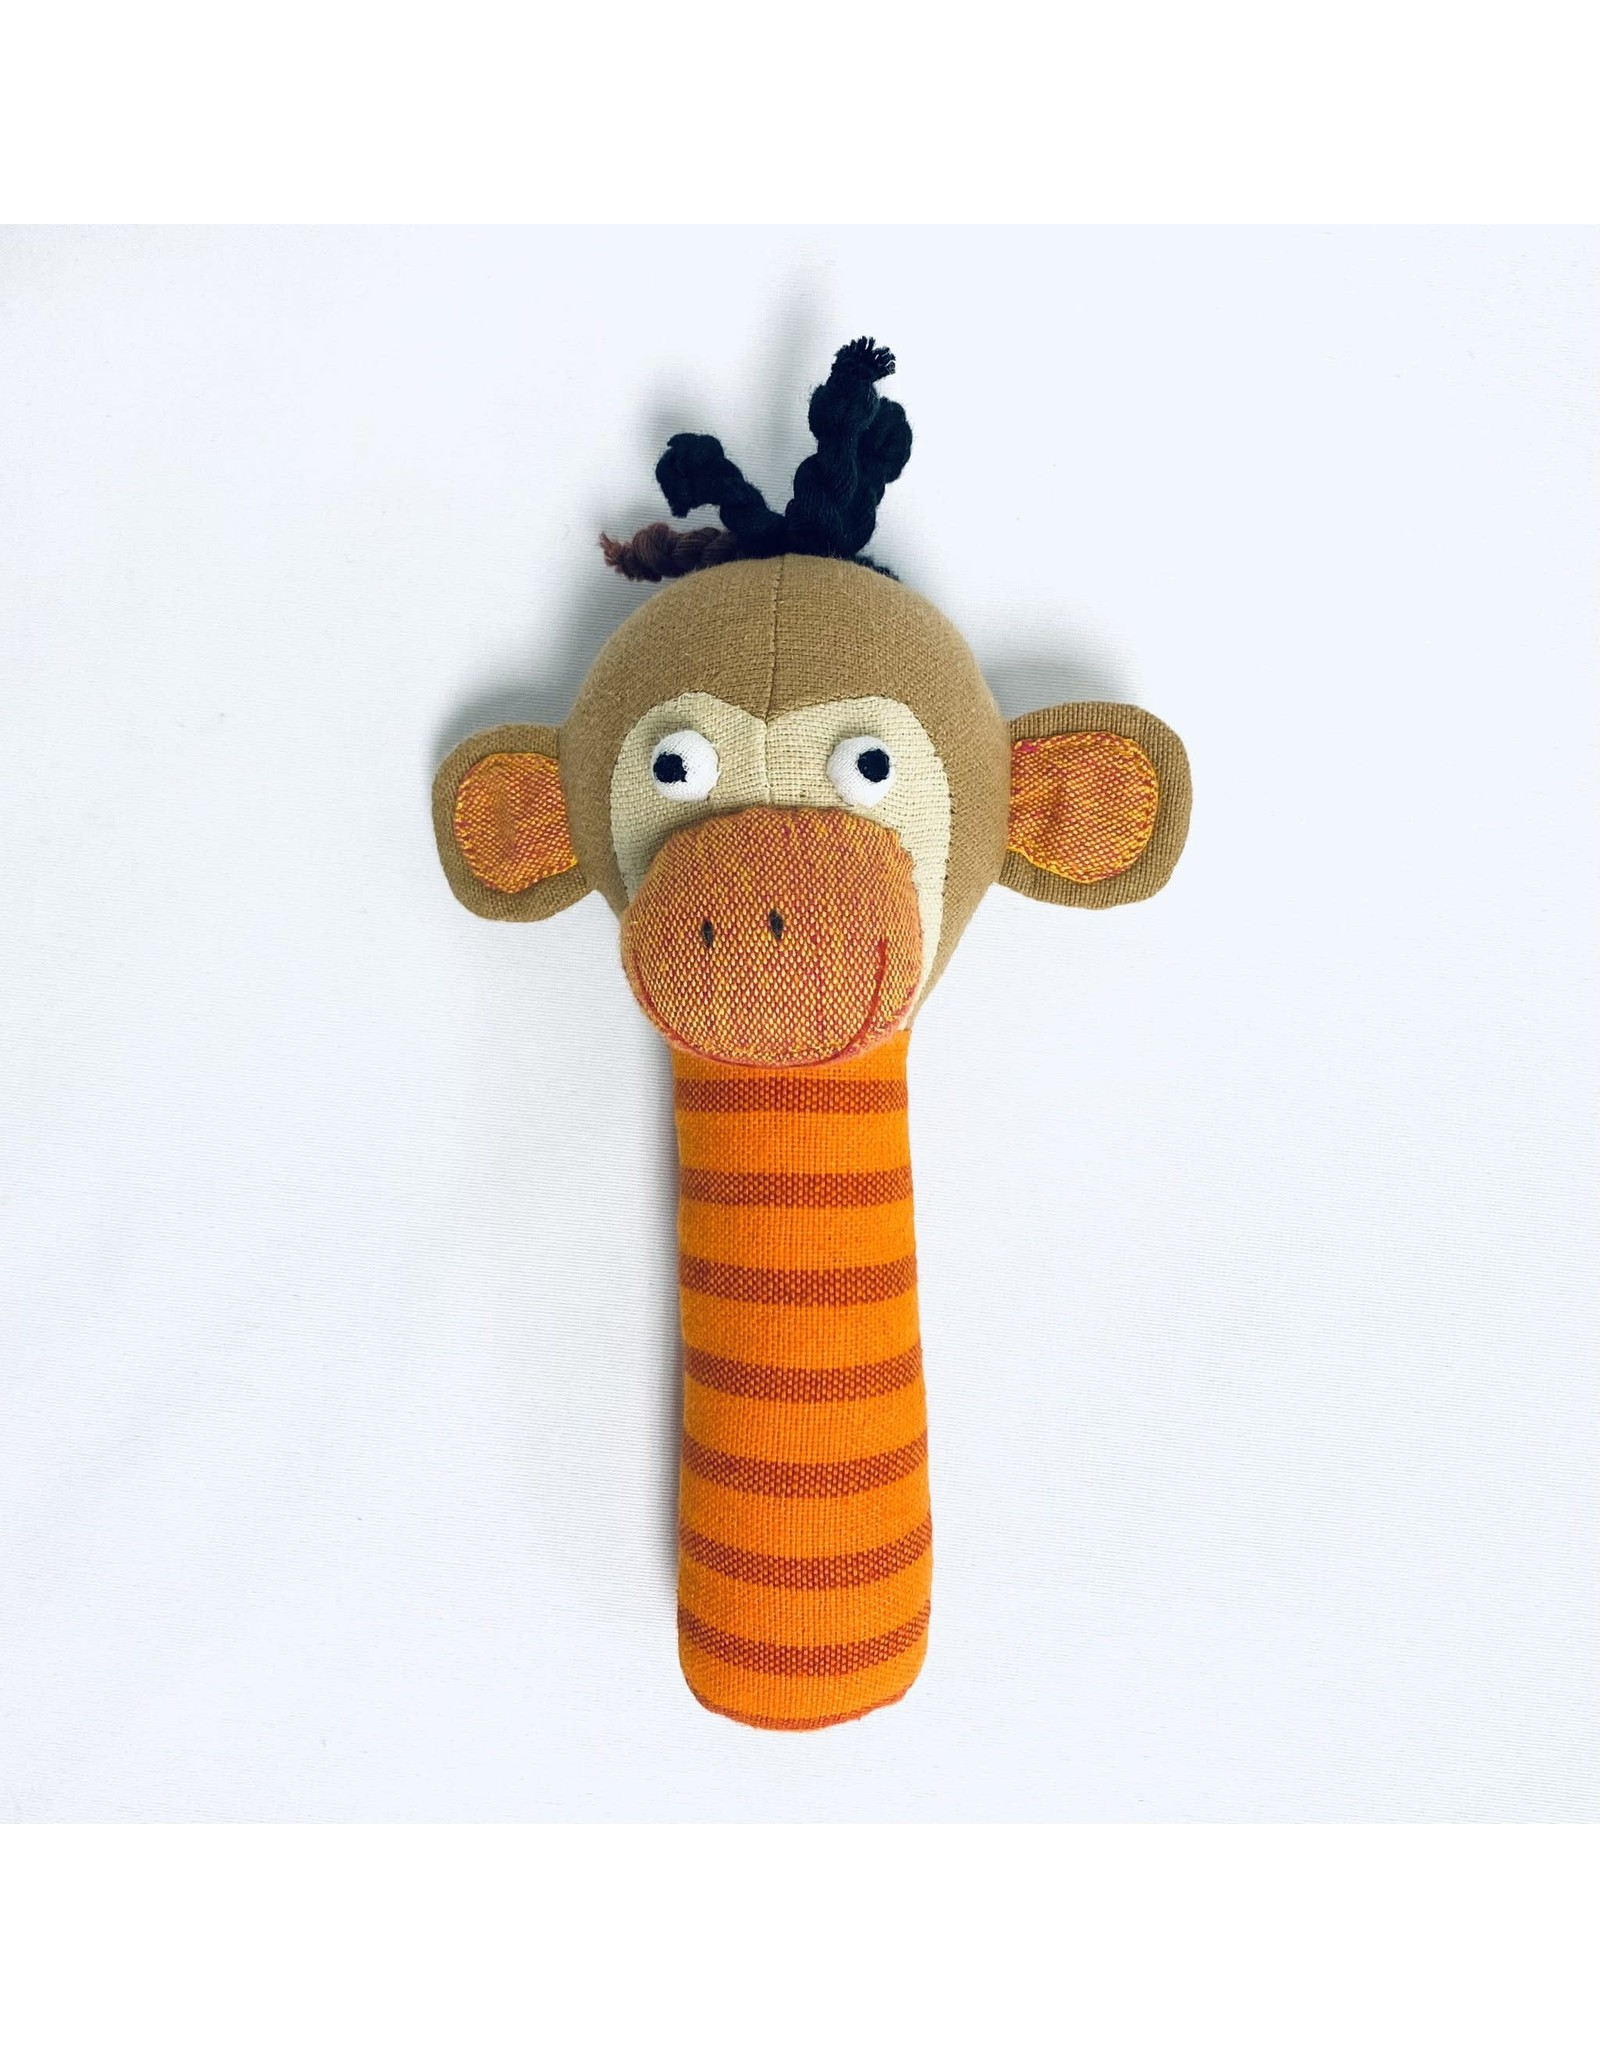 Mr. Ellie Pooh Stick Rattle Monkey, Sri Lanka